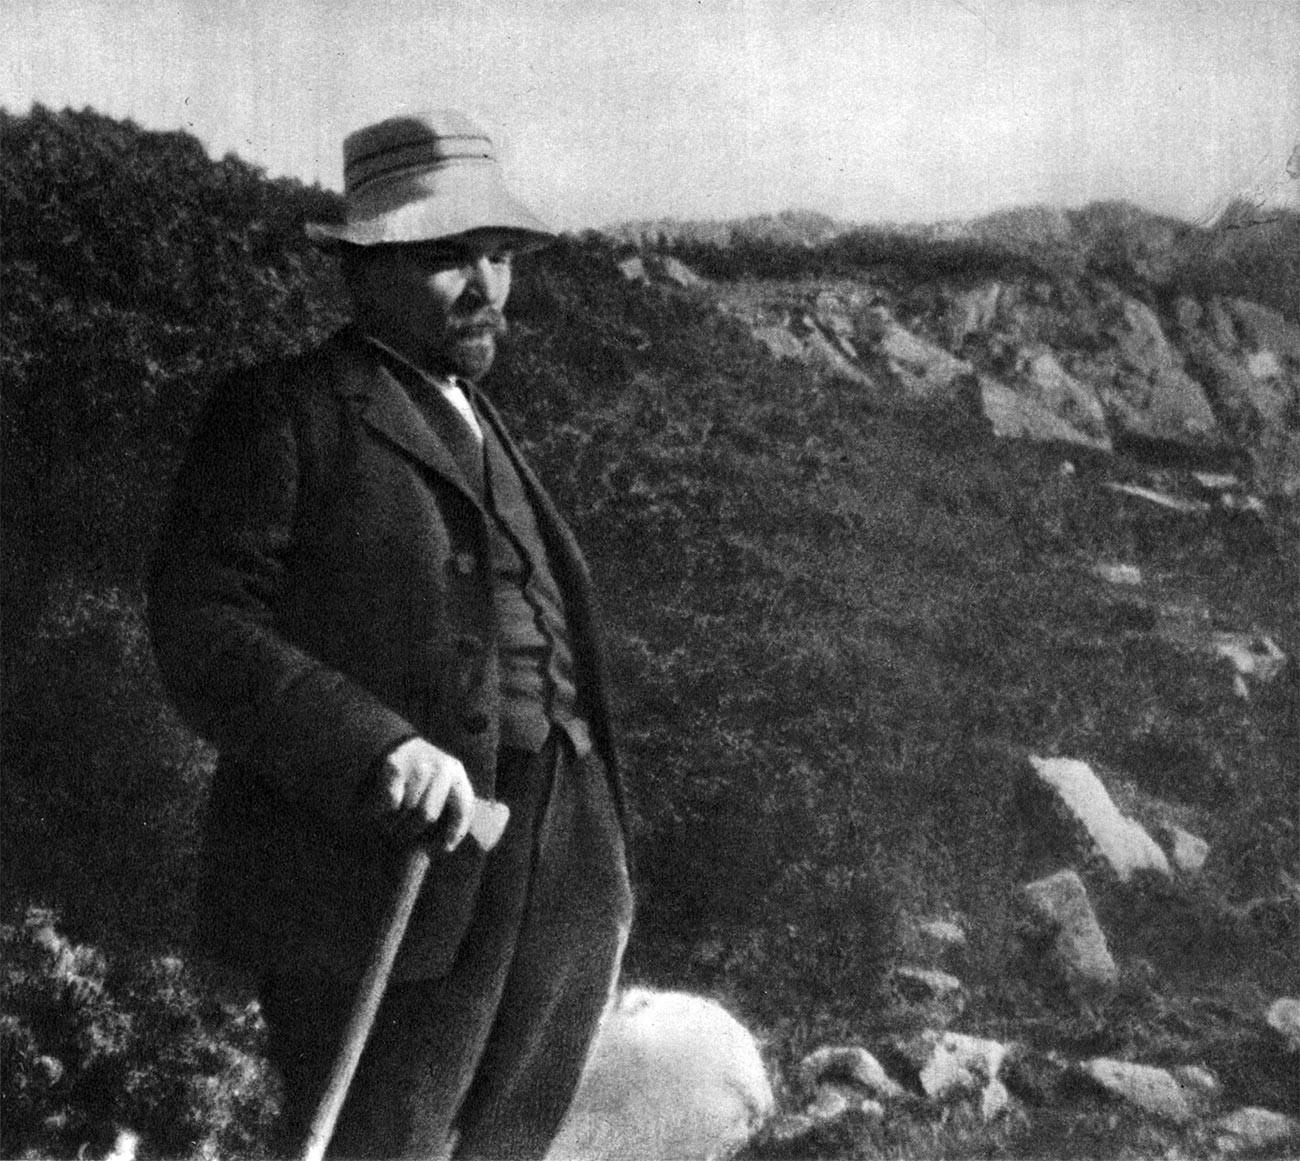 Vladimir Lénine en Pologne, 1914